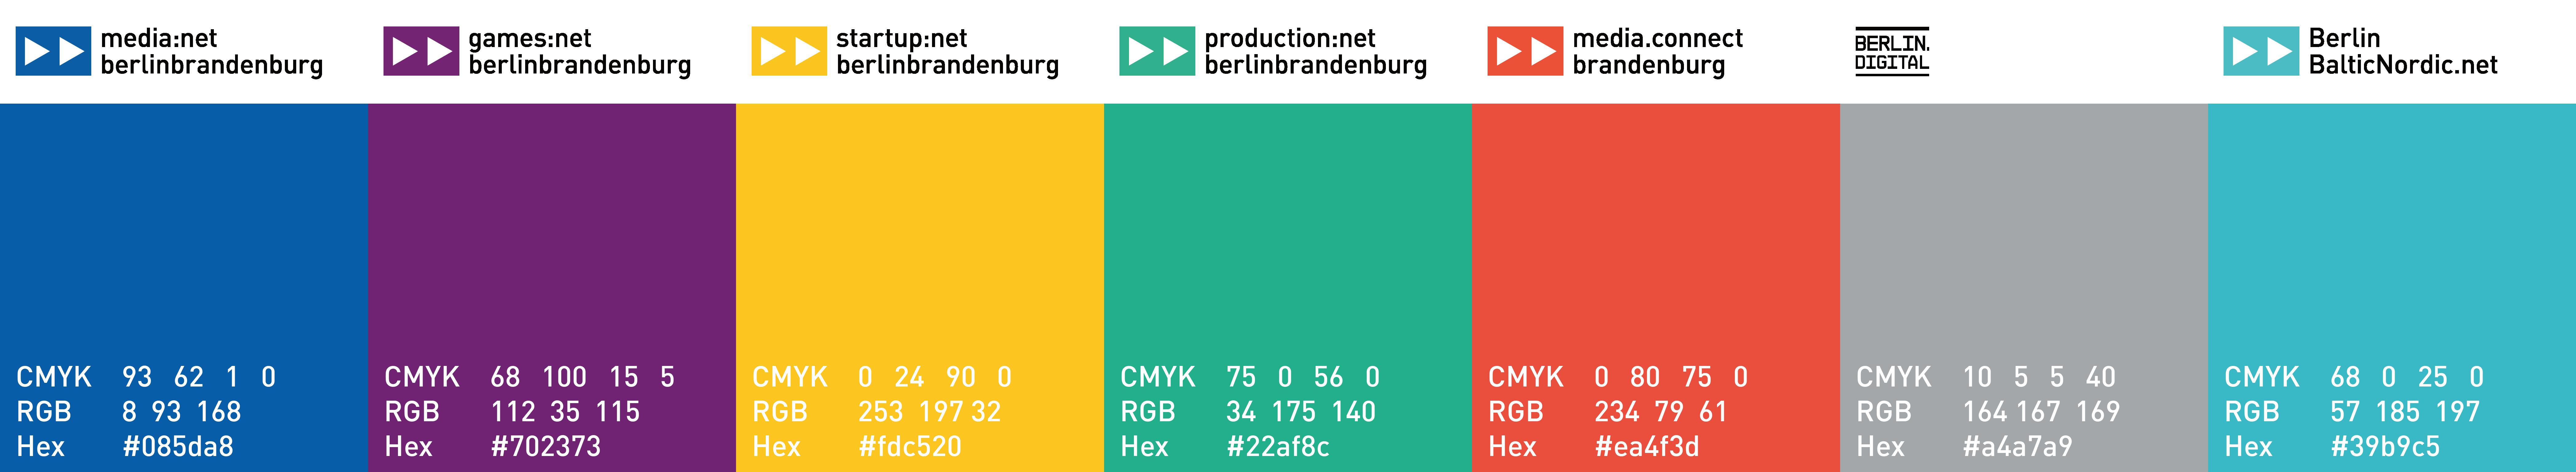 Redesign CI Farben media net berlinbrandenburg und Initiativen - Corporate Identity